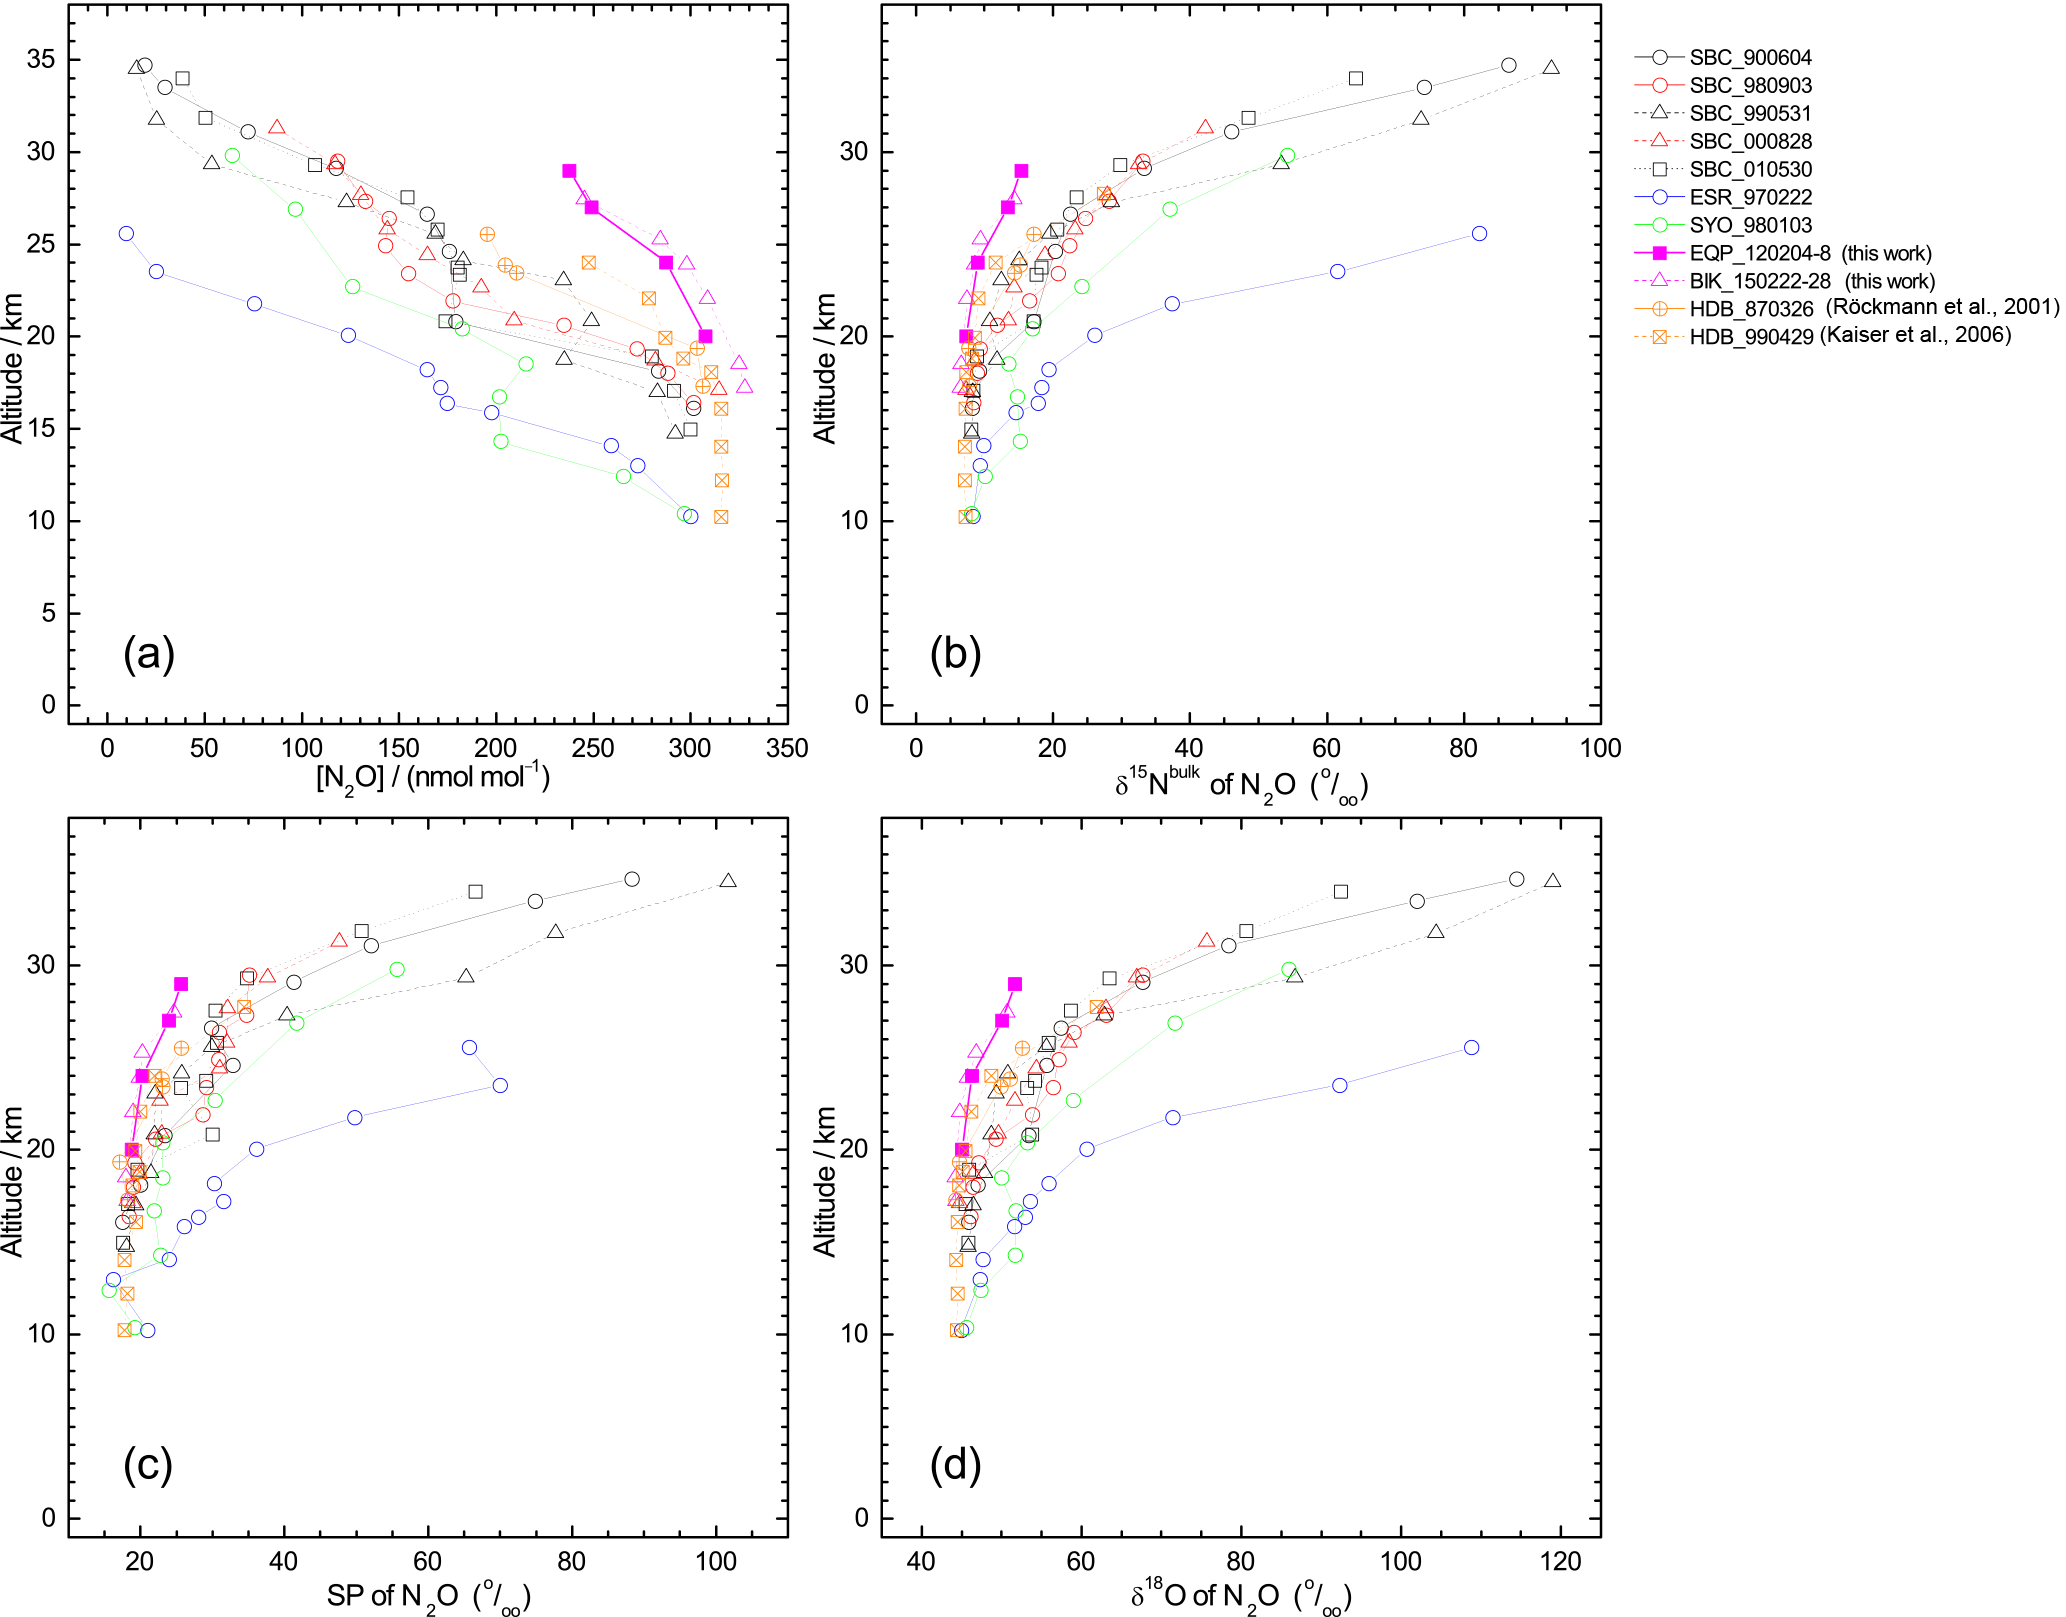 https://www.atmos-chem-phys.net/18/833/2018/acp-18-833-2018-f02